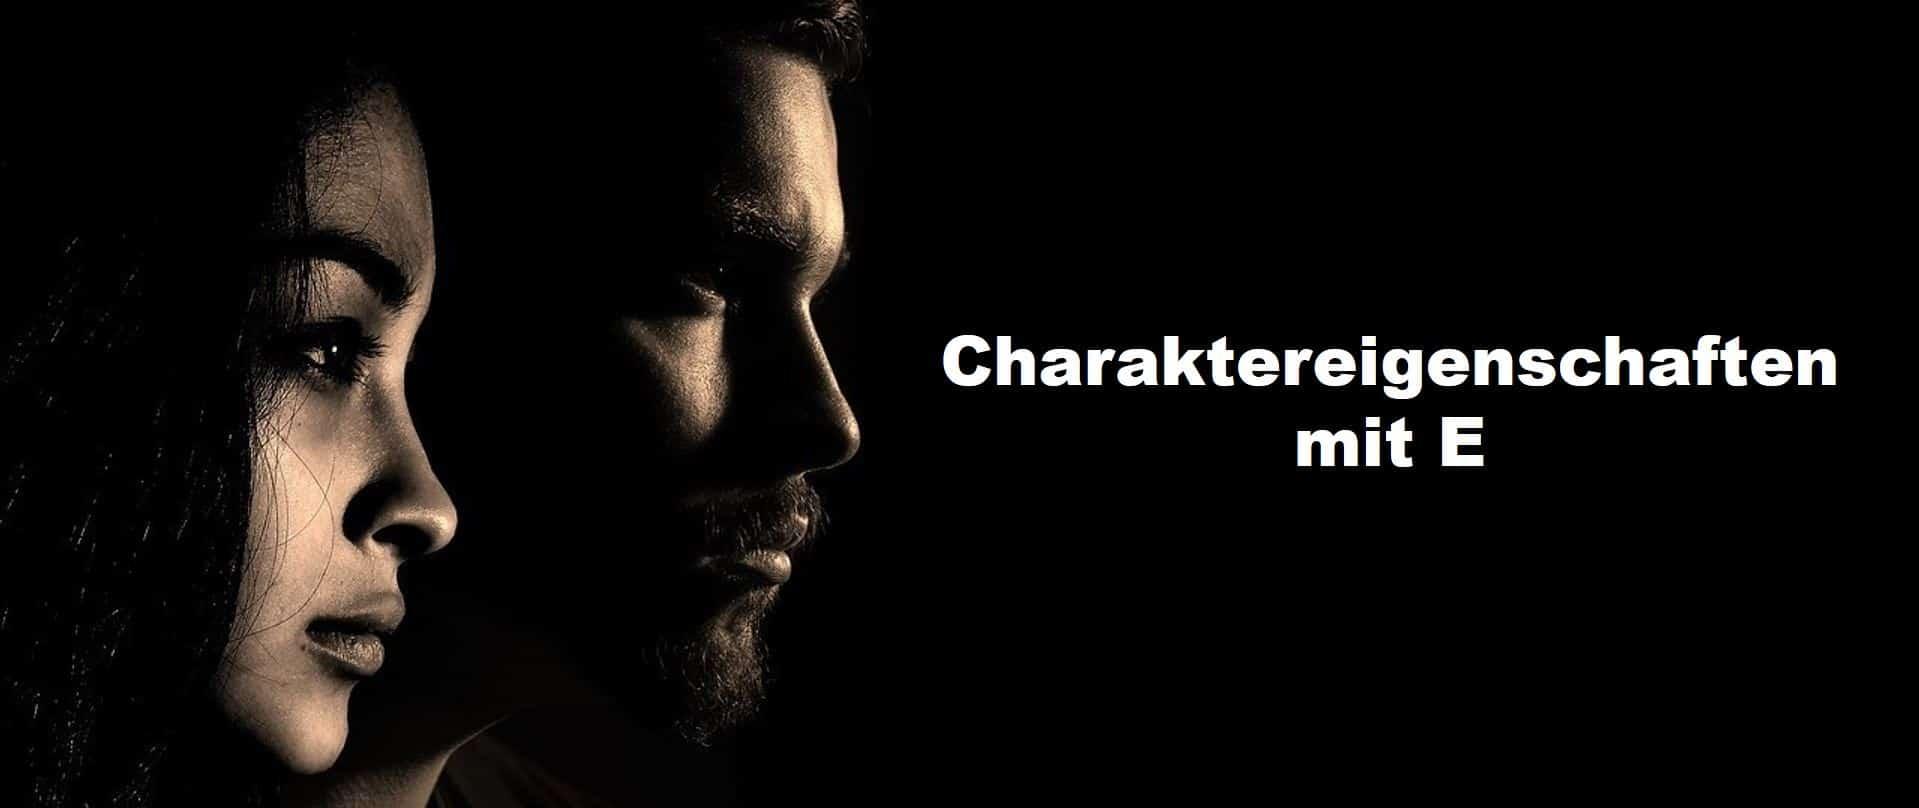 Charaktereigenschaften als Adjektive mit E